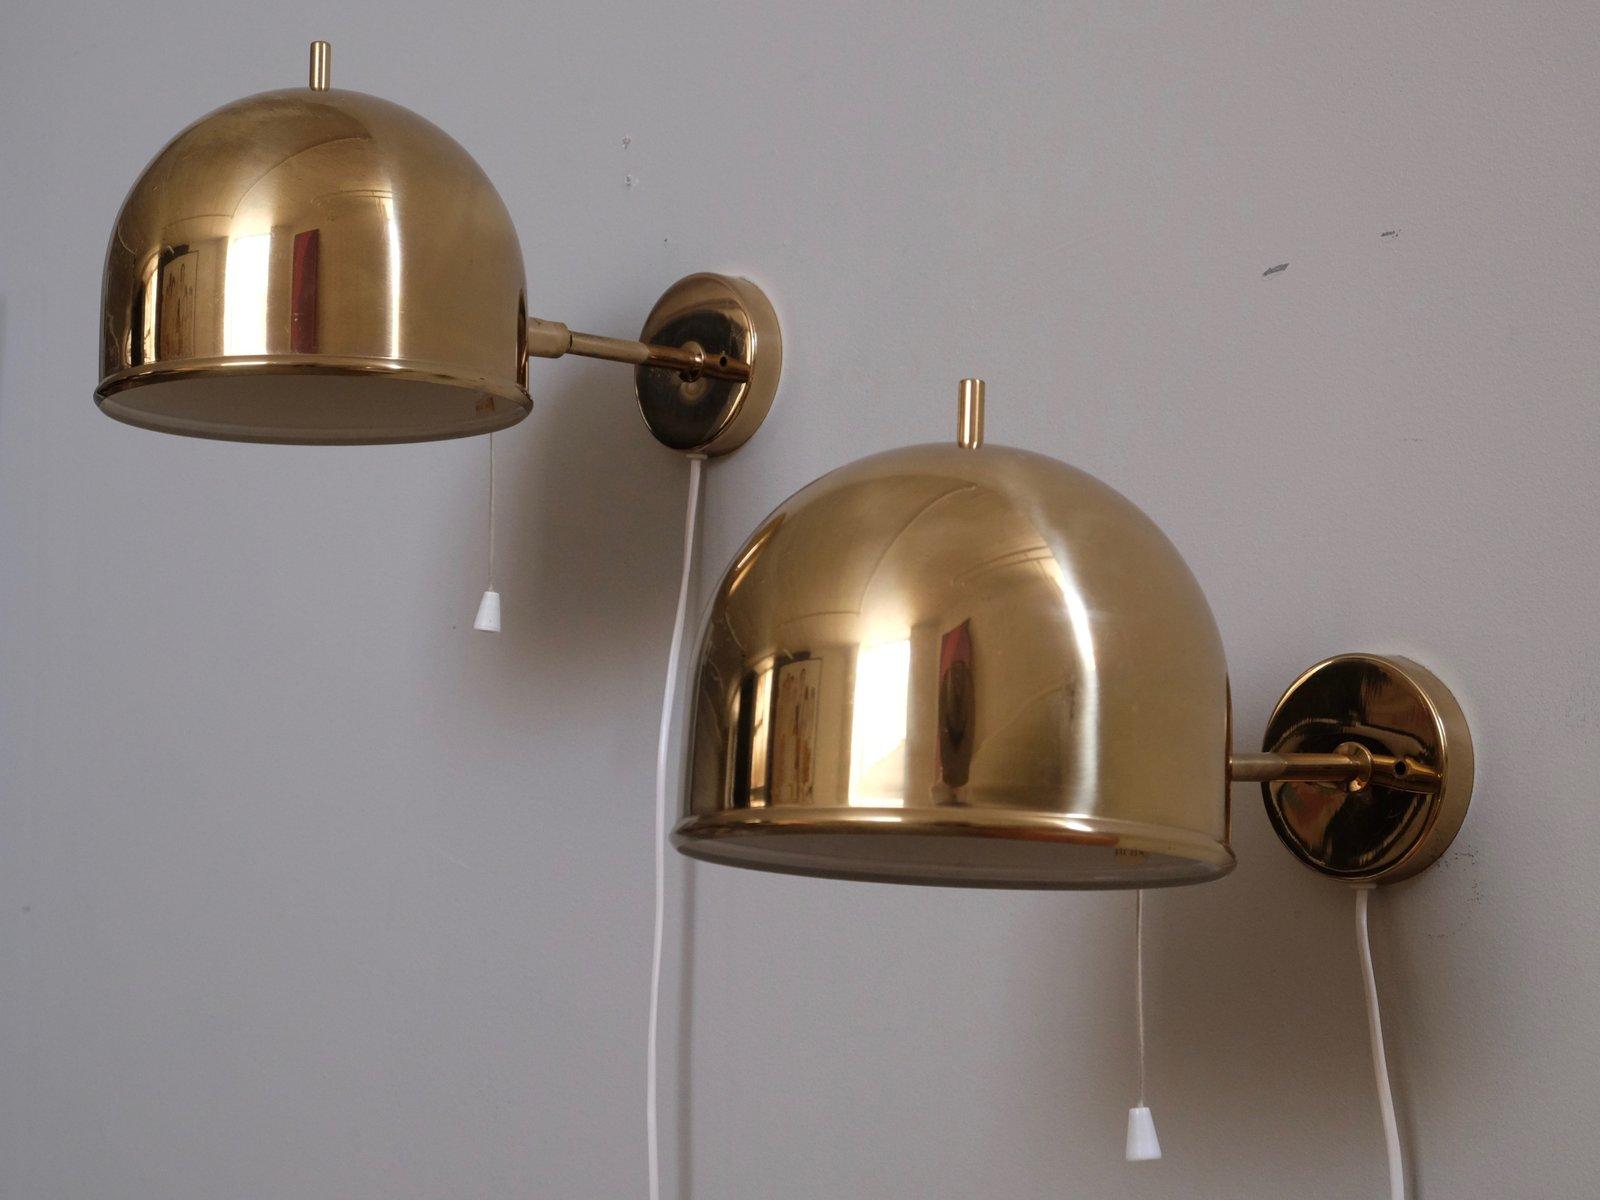 Messing Wandlampe von Bergboms, 1960er